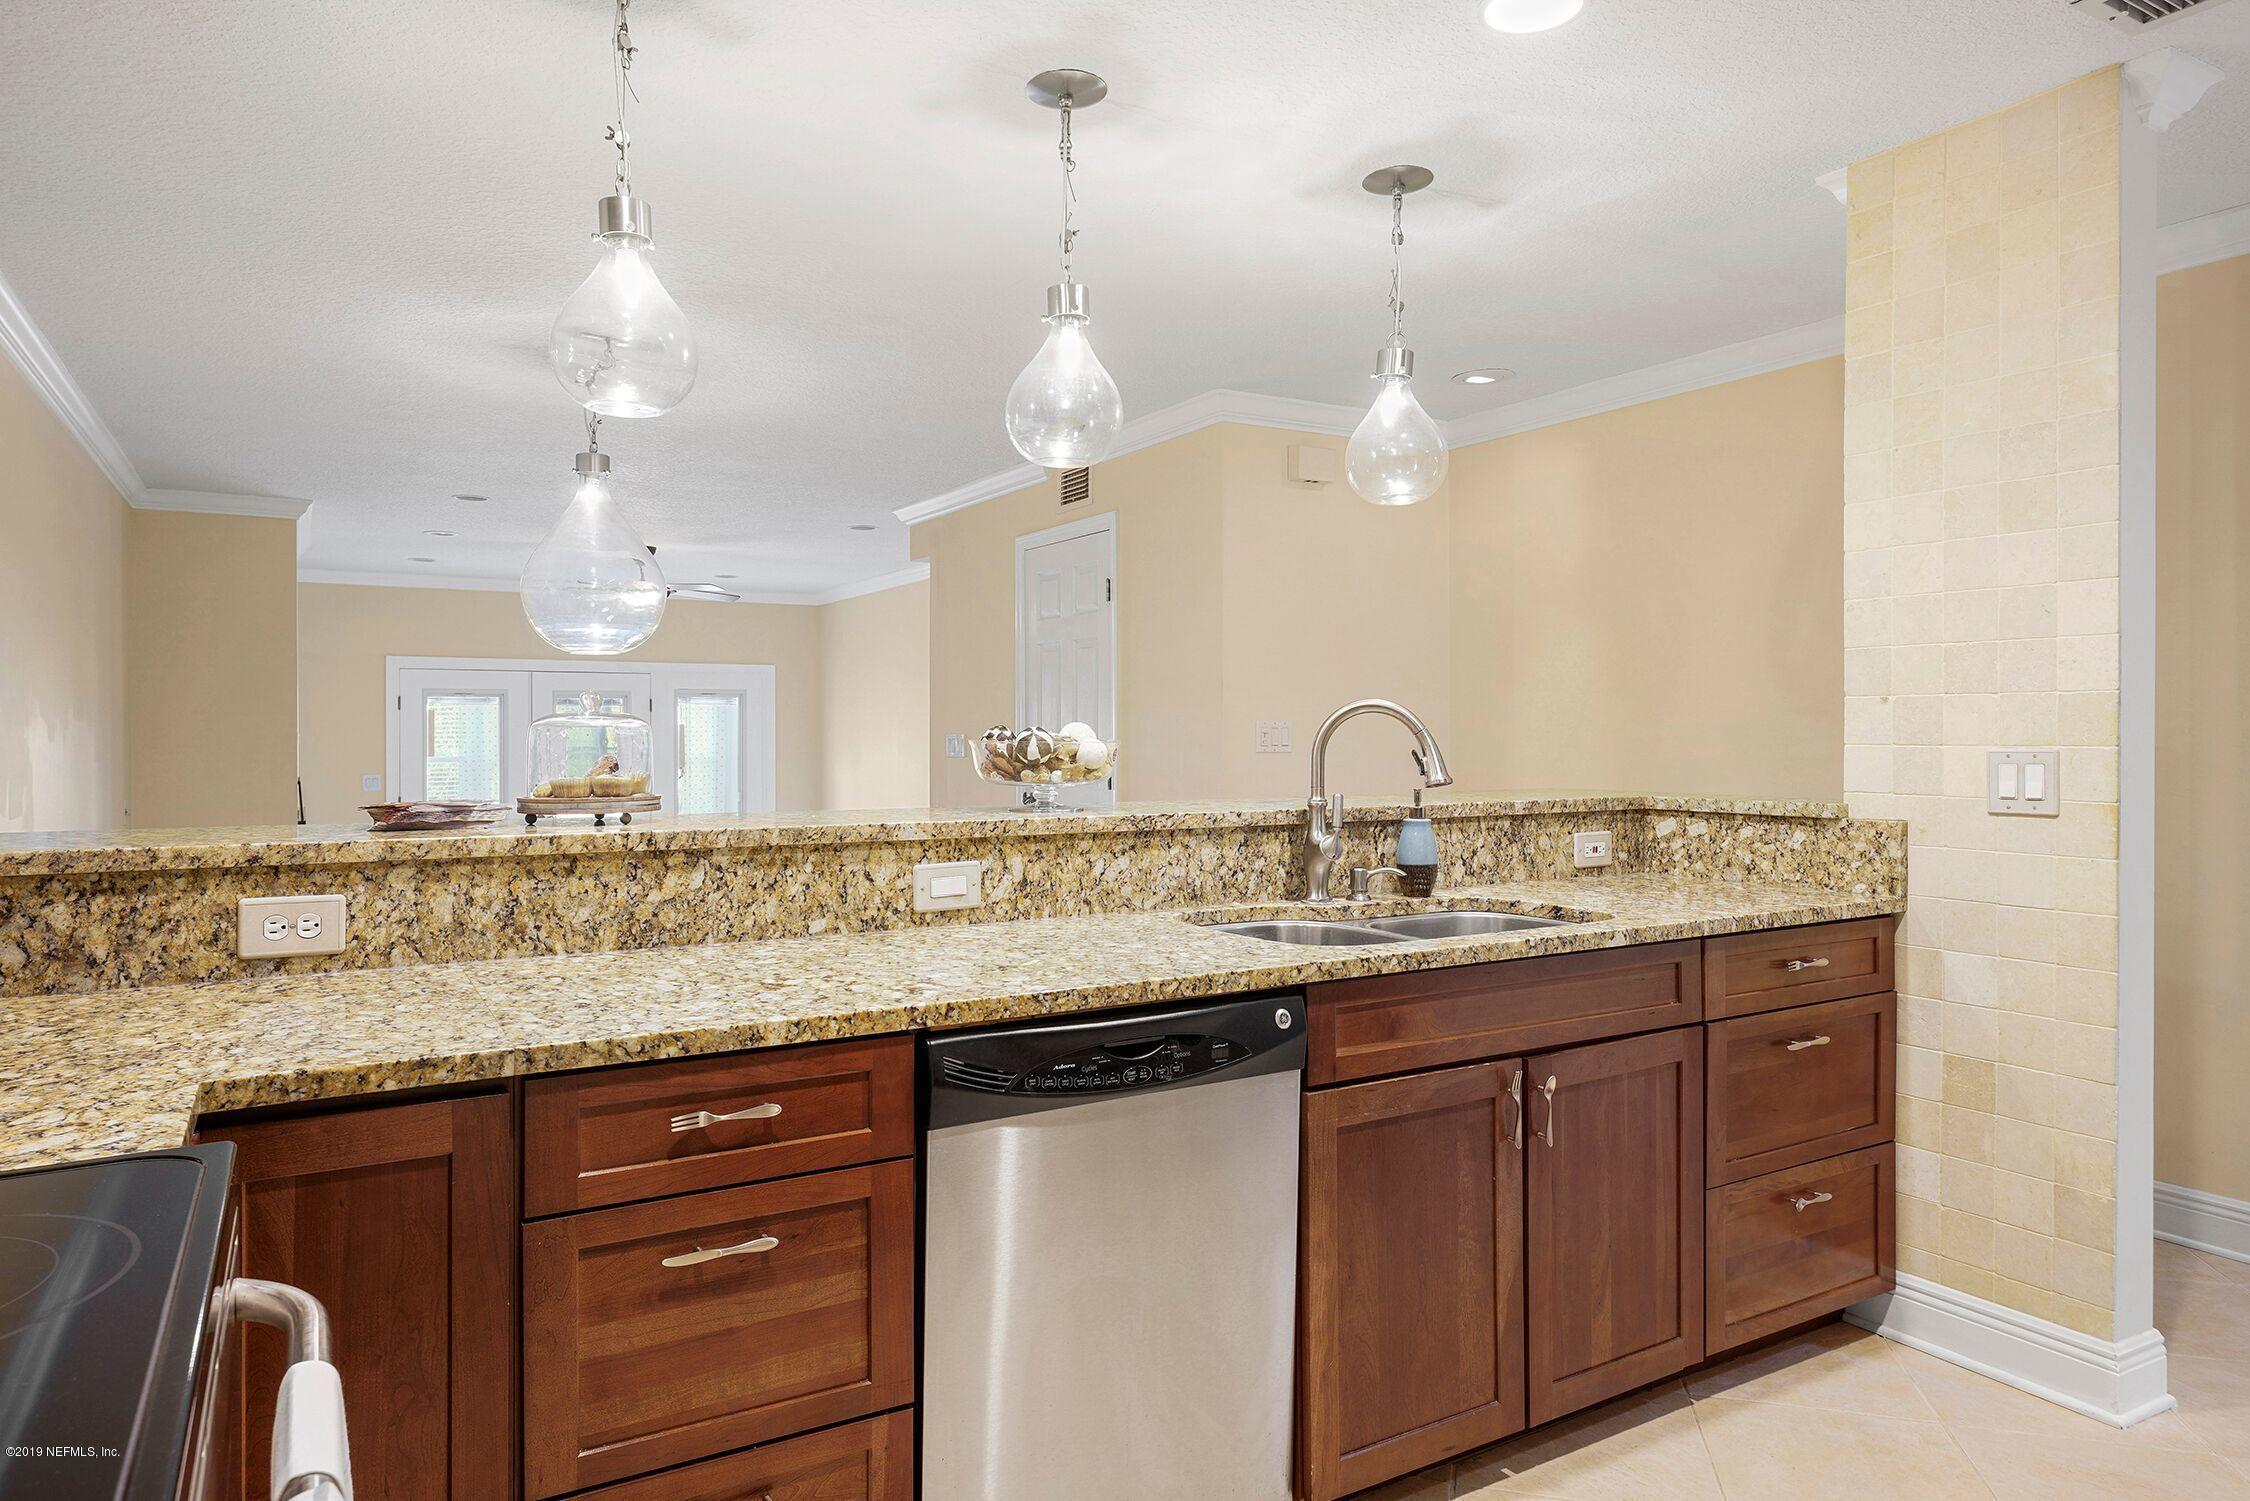 646 PONTE VEDRA, PONTE VEDRA BEACH, FLORIDA 32082, 2 Bedrooms Bedrooms, ,2 BathroomsBathrooms,Condo,For sale,PONTE VEDRA,1020086